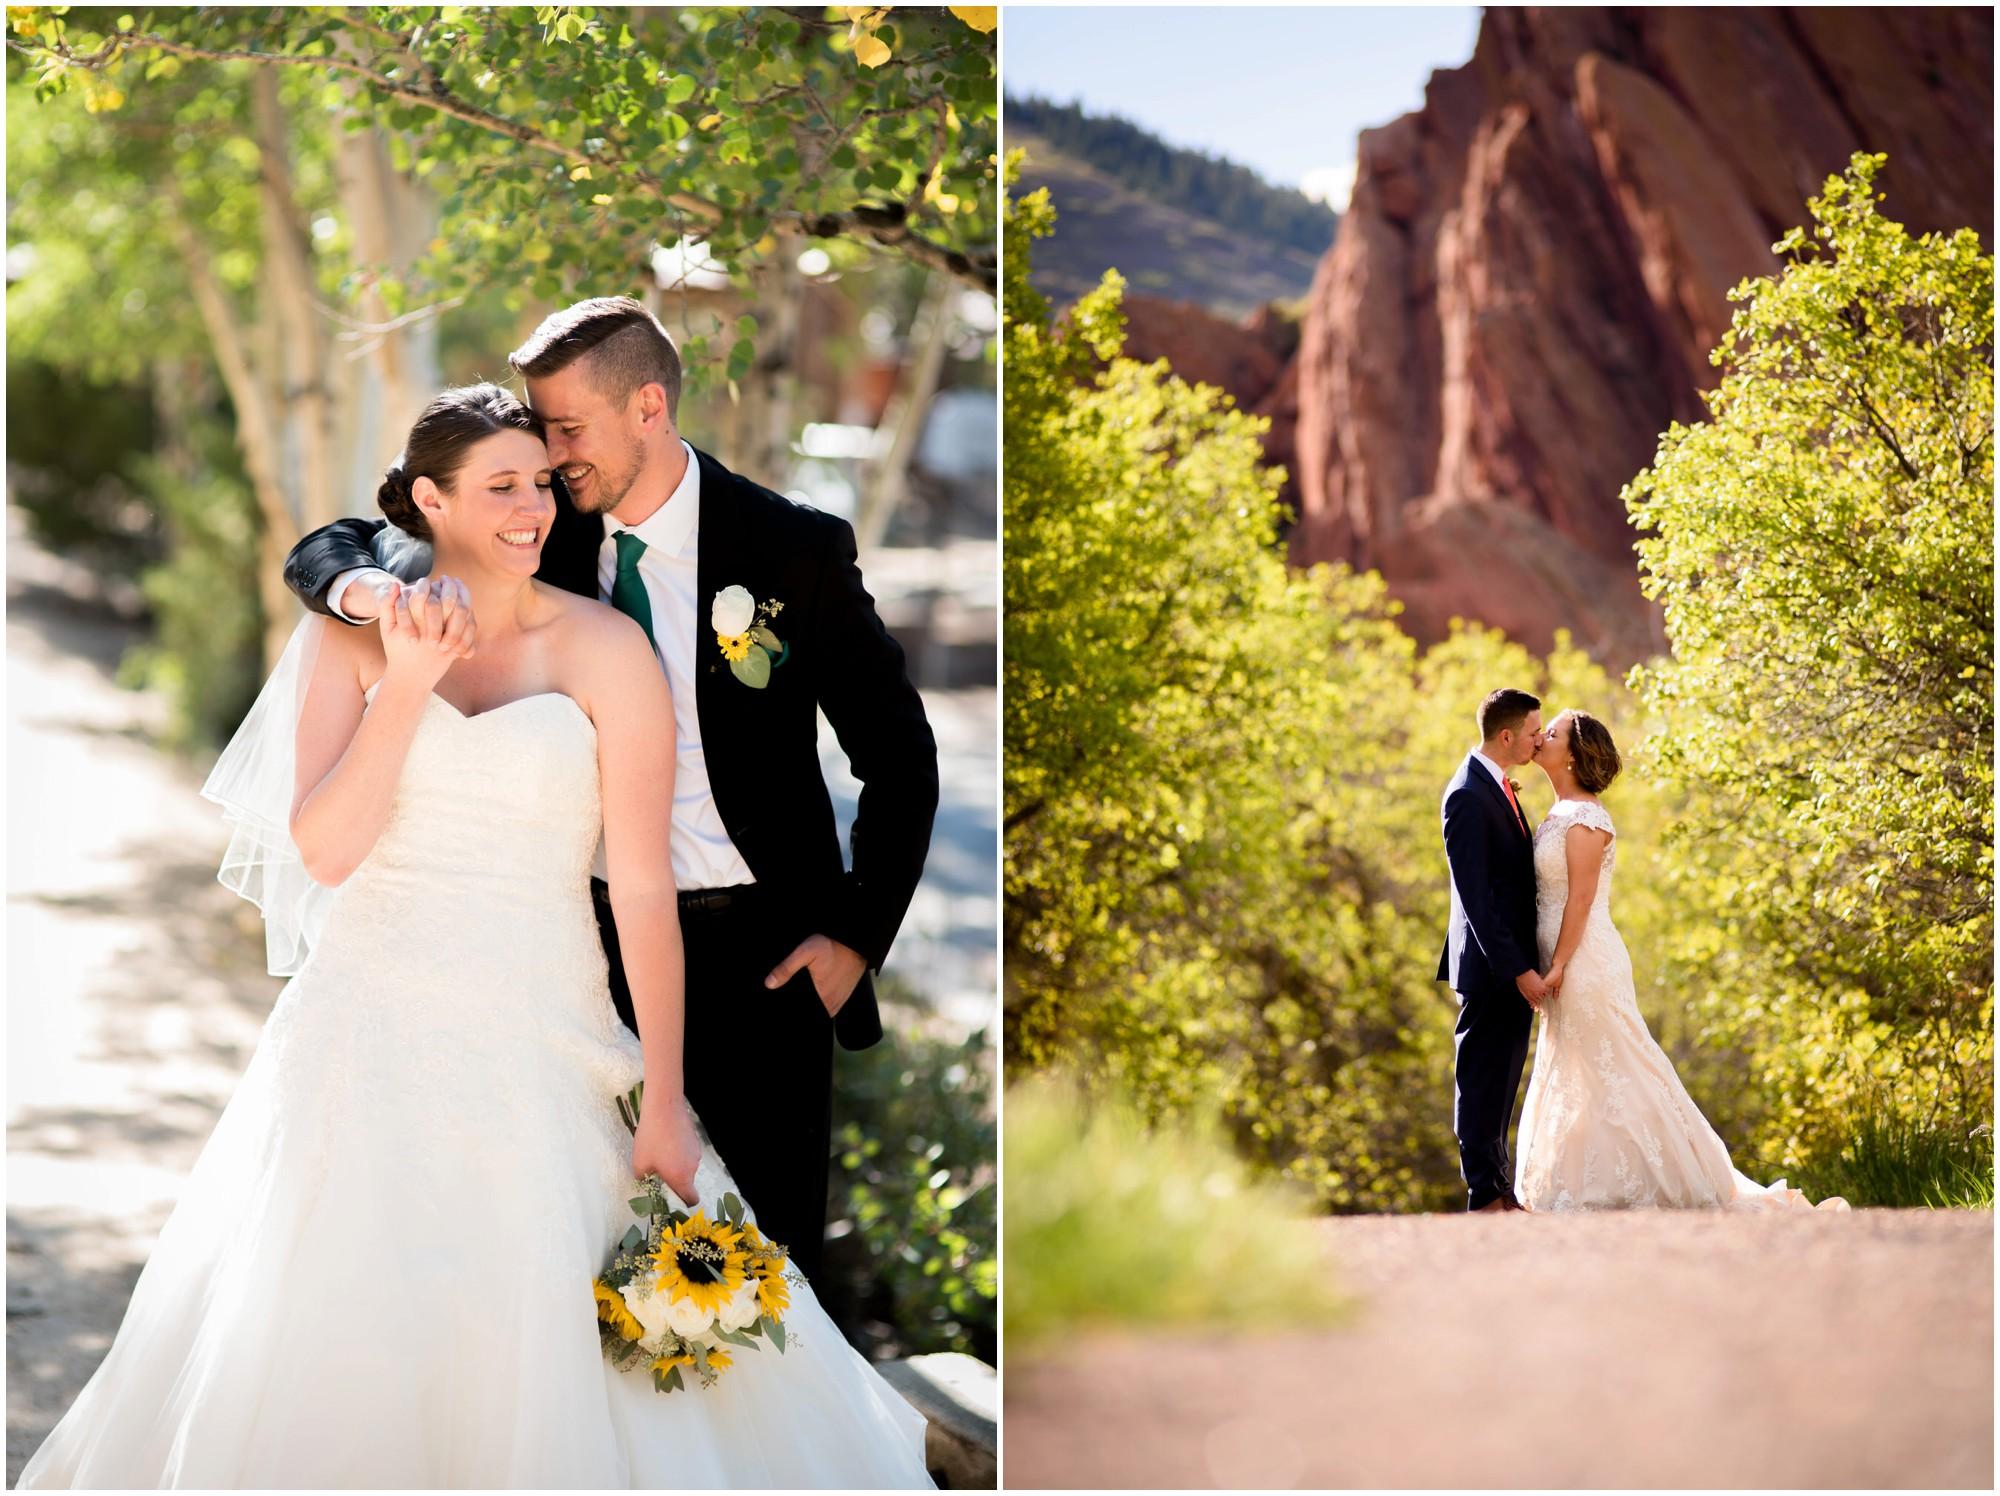 540-Estes-Park-fall-wedding-photography.jpg